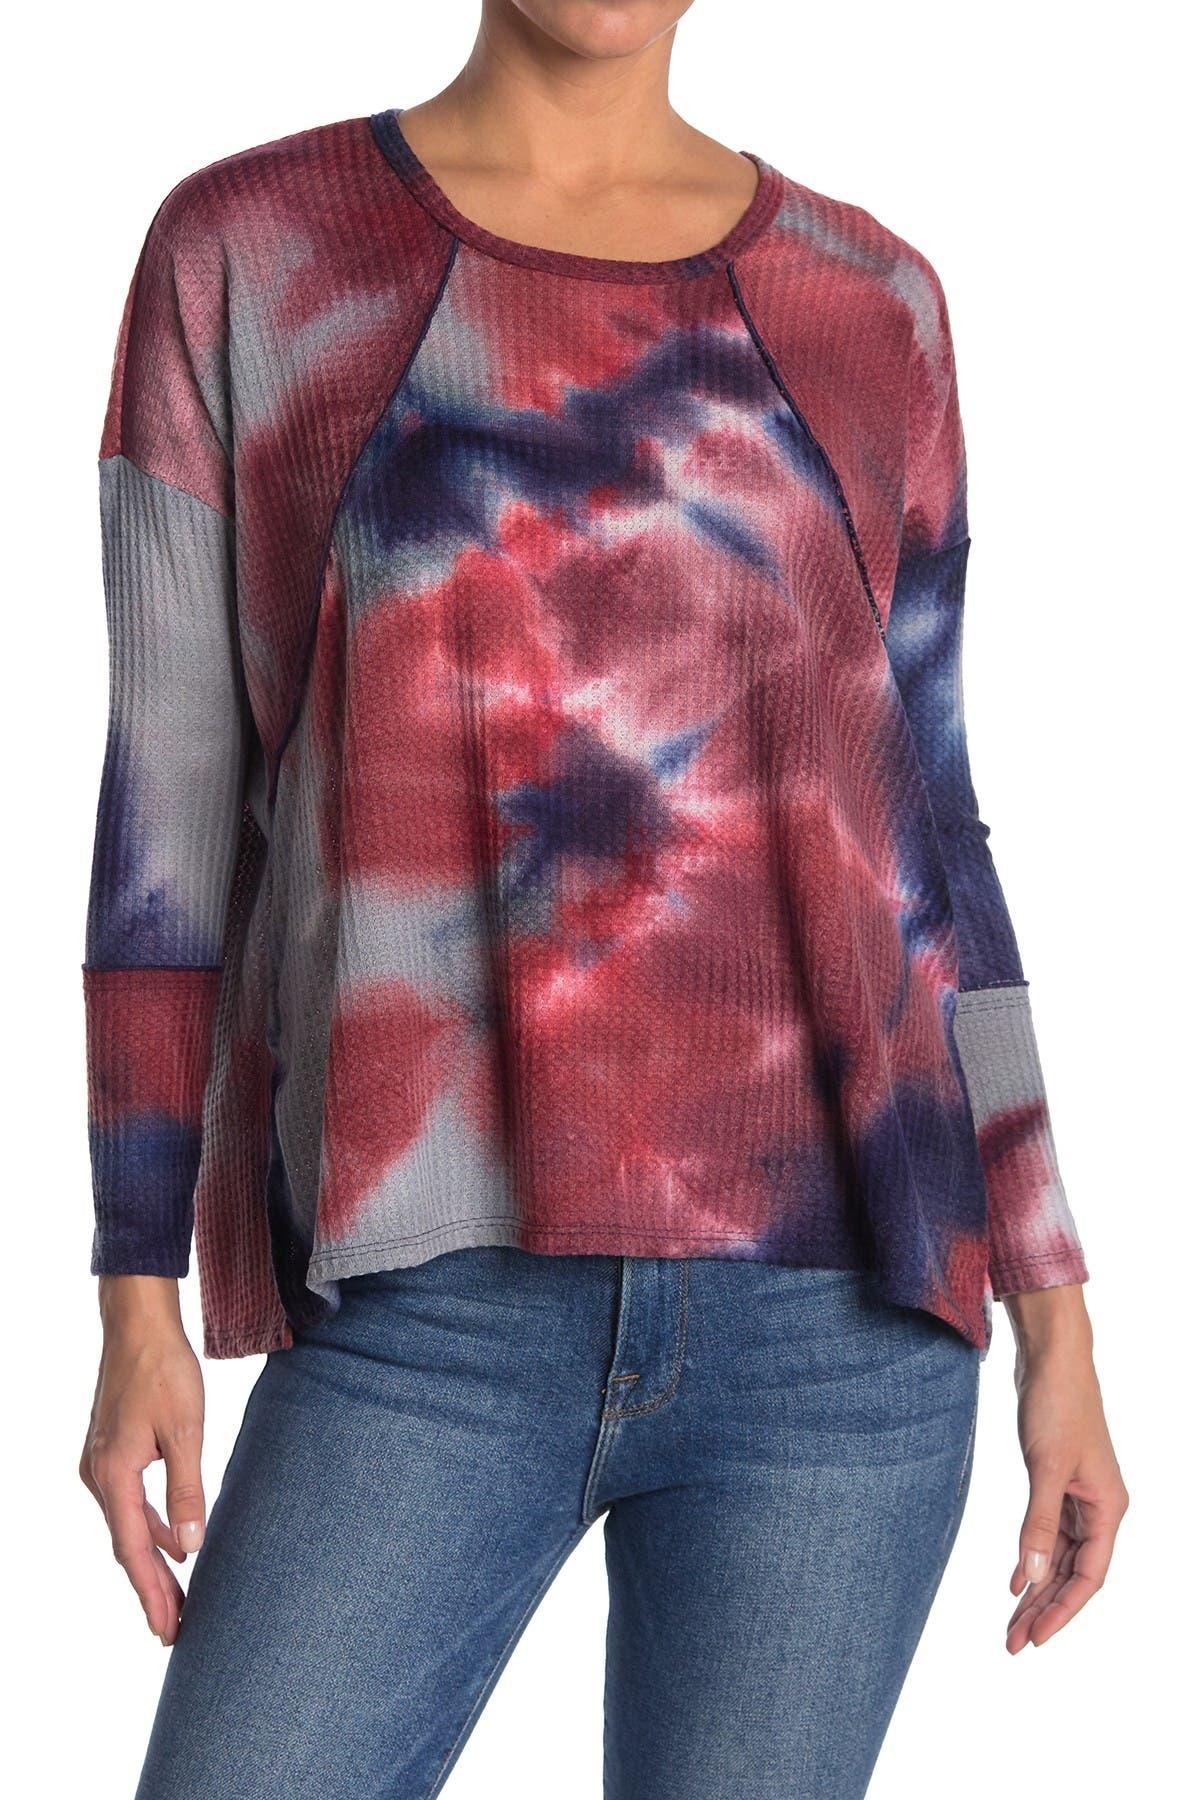 Image of Forgotten Grace Tie Dye Print Long Sleeve Thermal T-Shirt